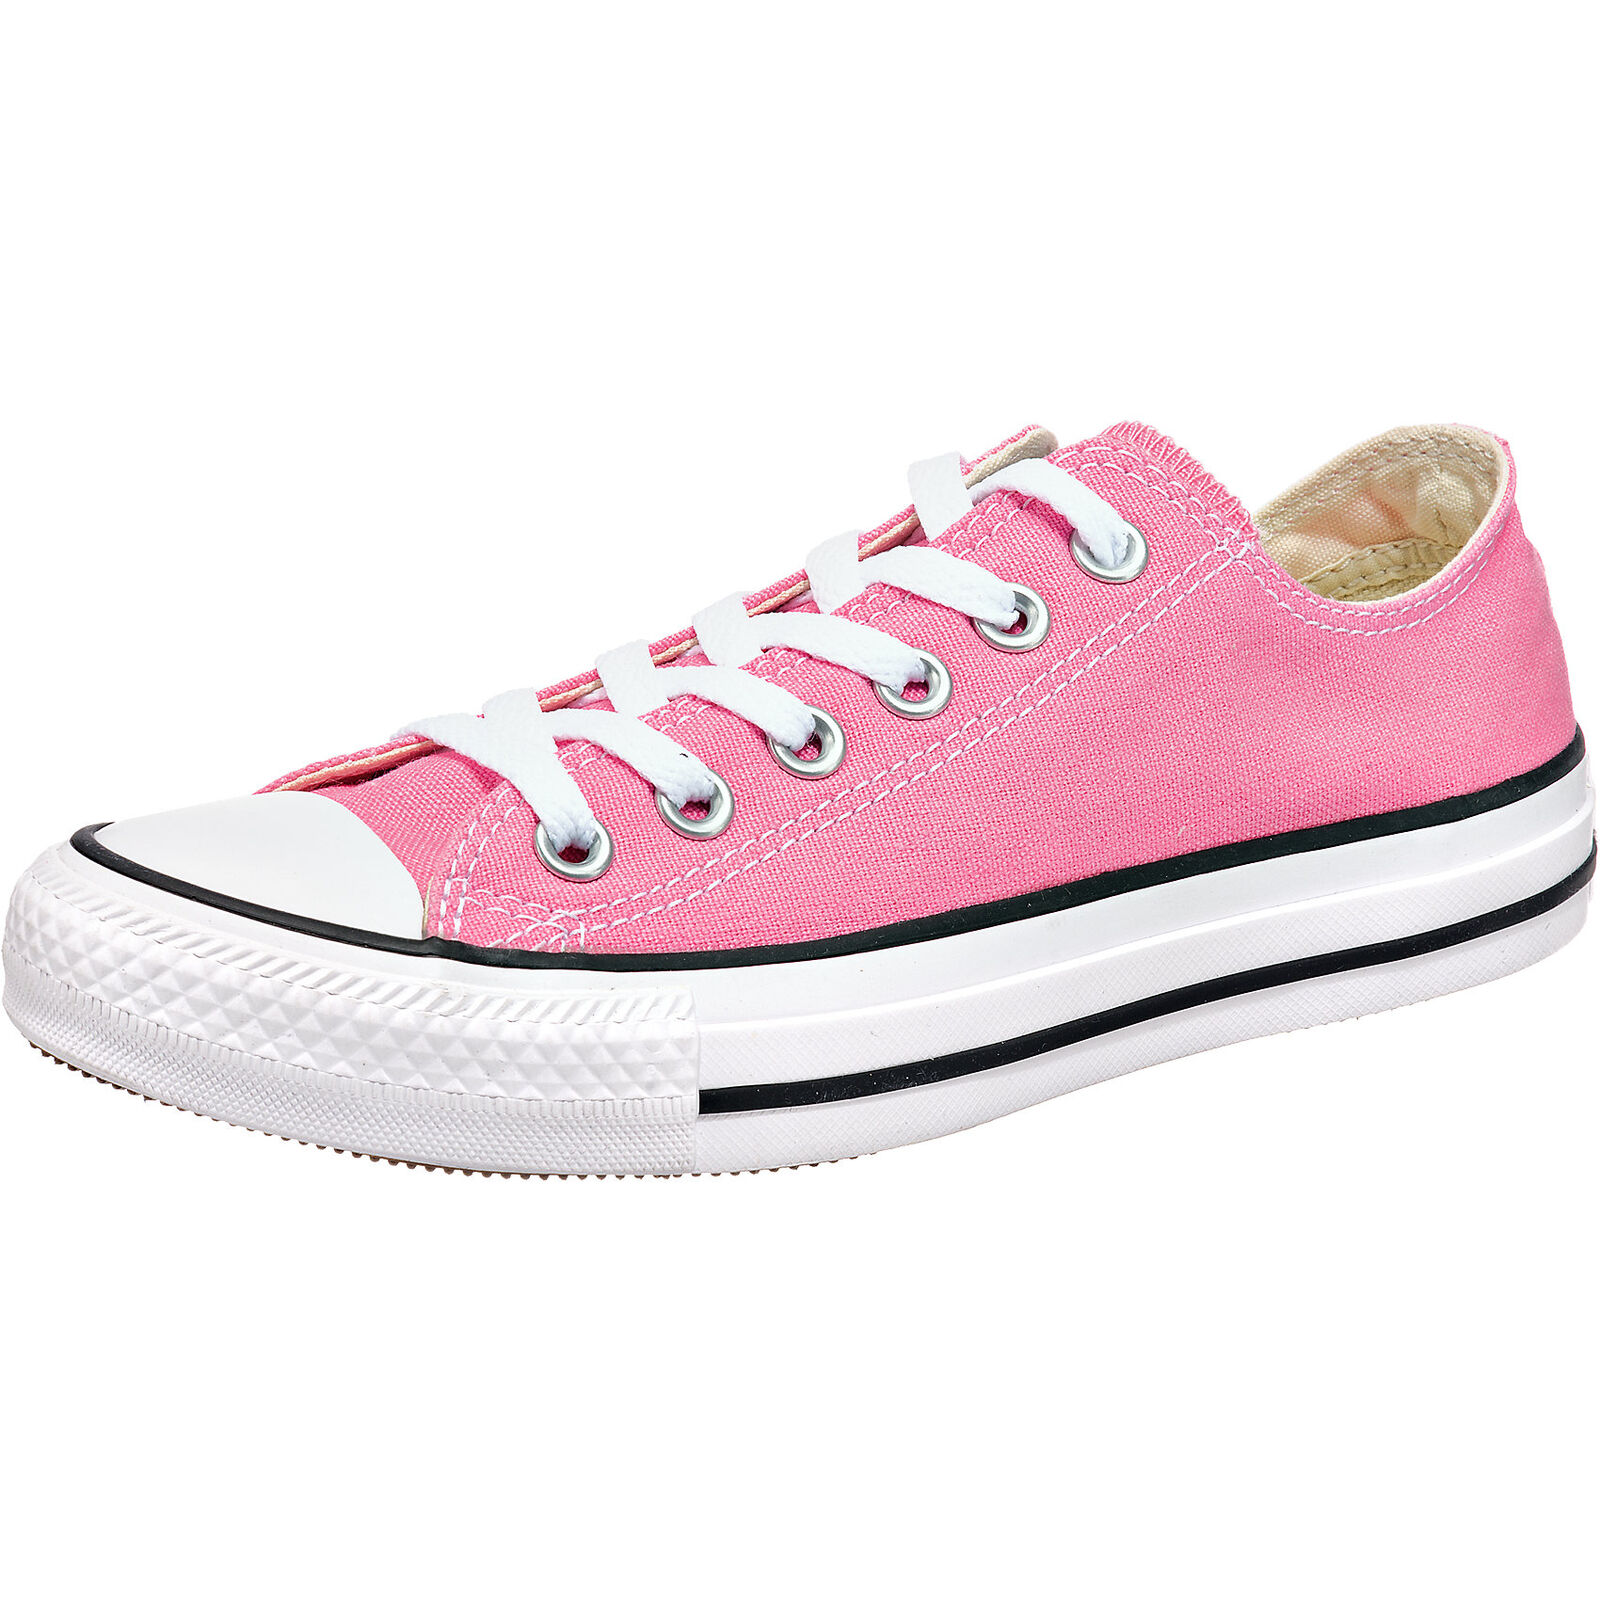 Neu CONVERSE Chuck Taylor All Star Ox Sneakers rosa 5773306